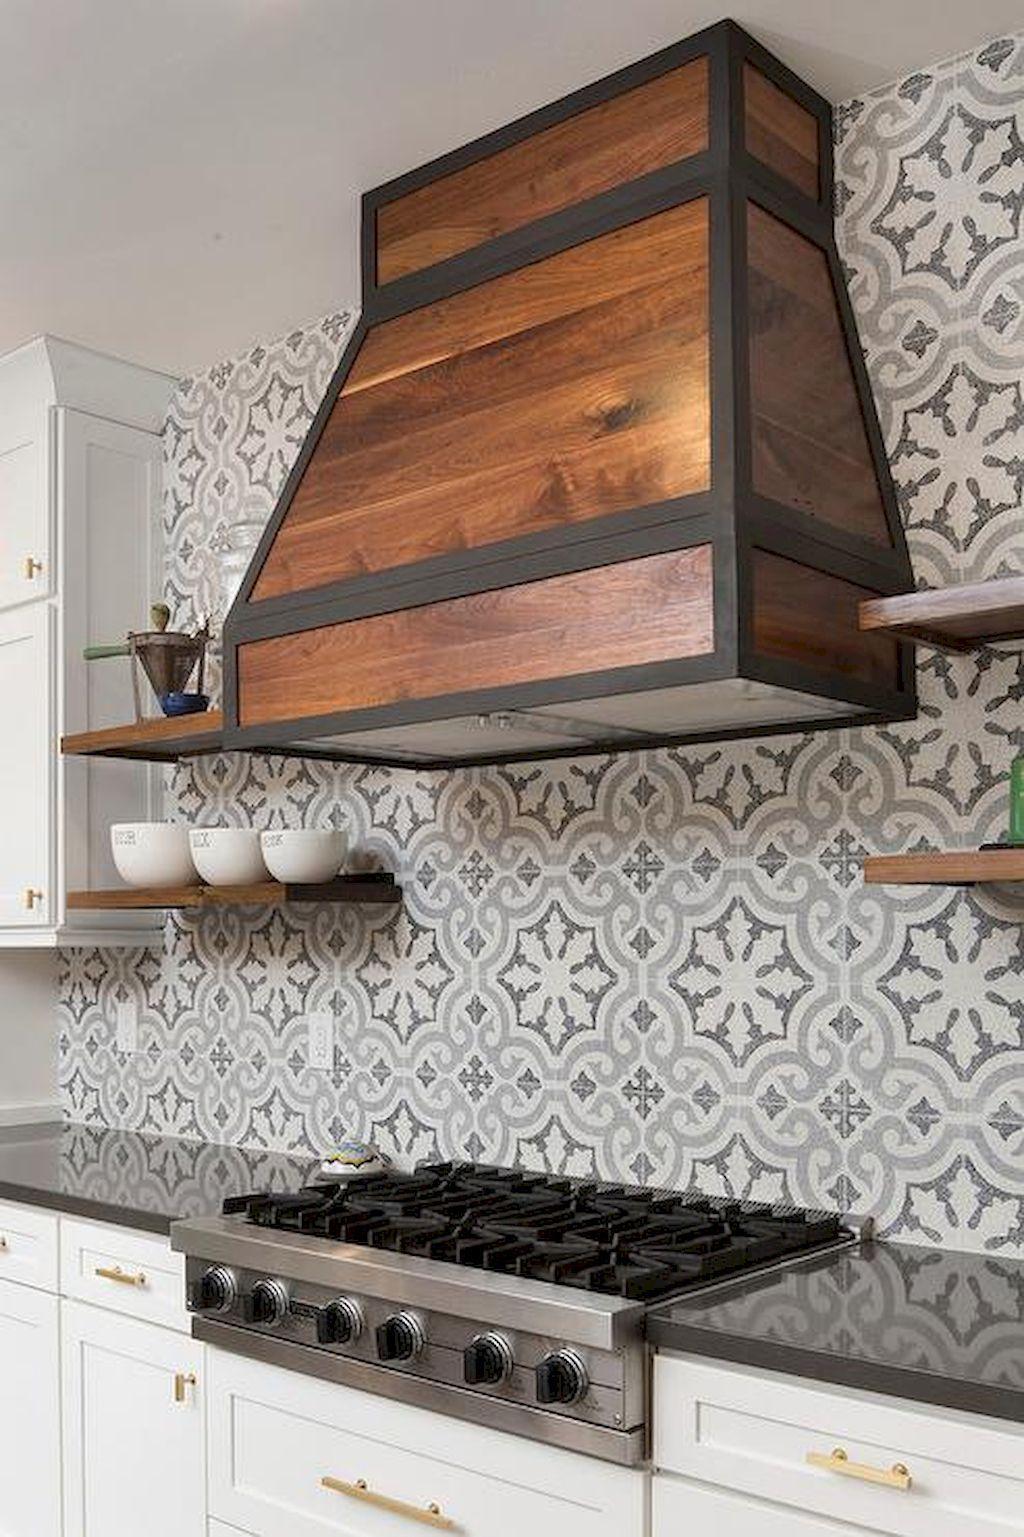 stunning kitchen backsplash tile design idea | Stunning kitchen backsplash decorating ideas (16) | Tile ...